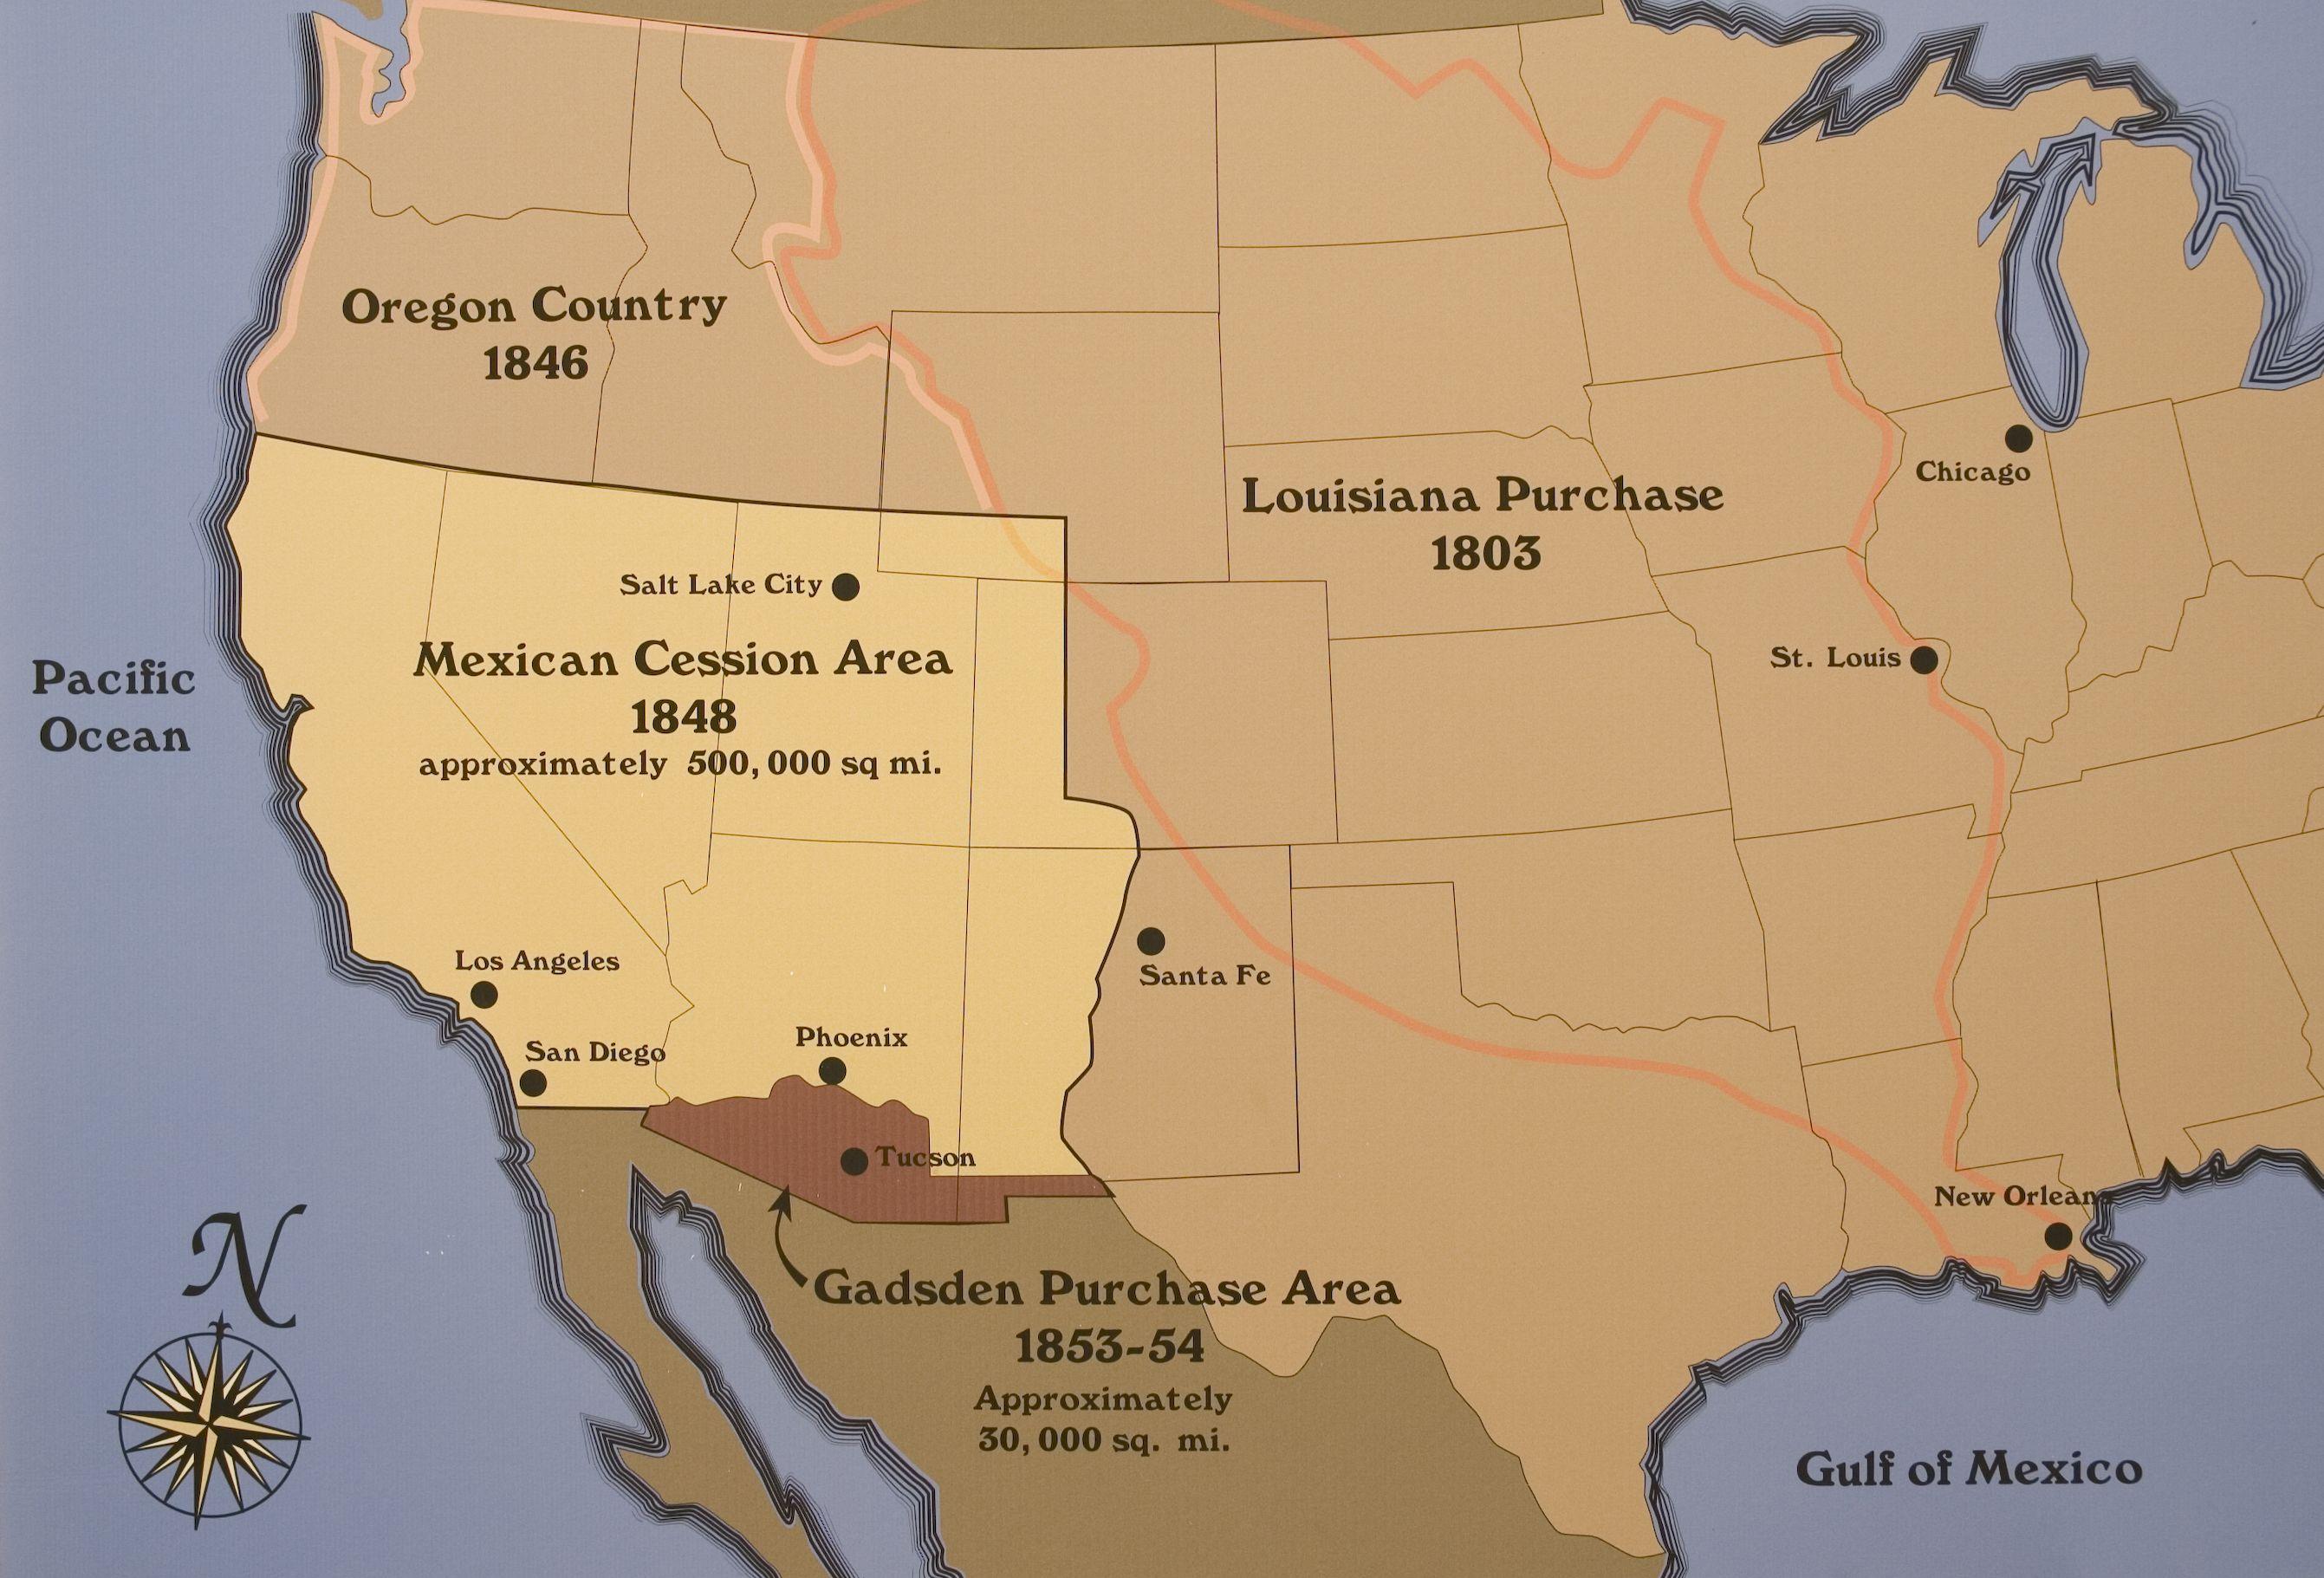 CC3 HIST wk 6 10 Louisiana Gadsden Purchases to teach CC3